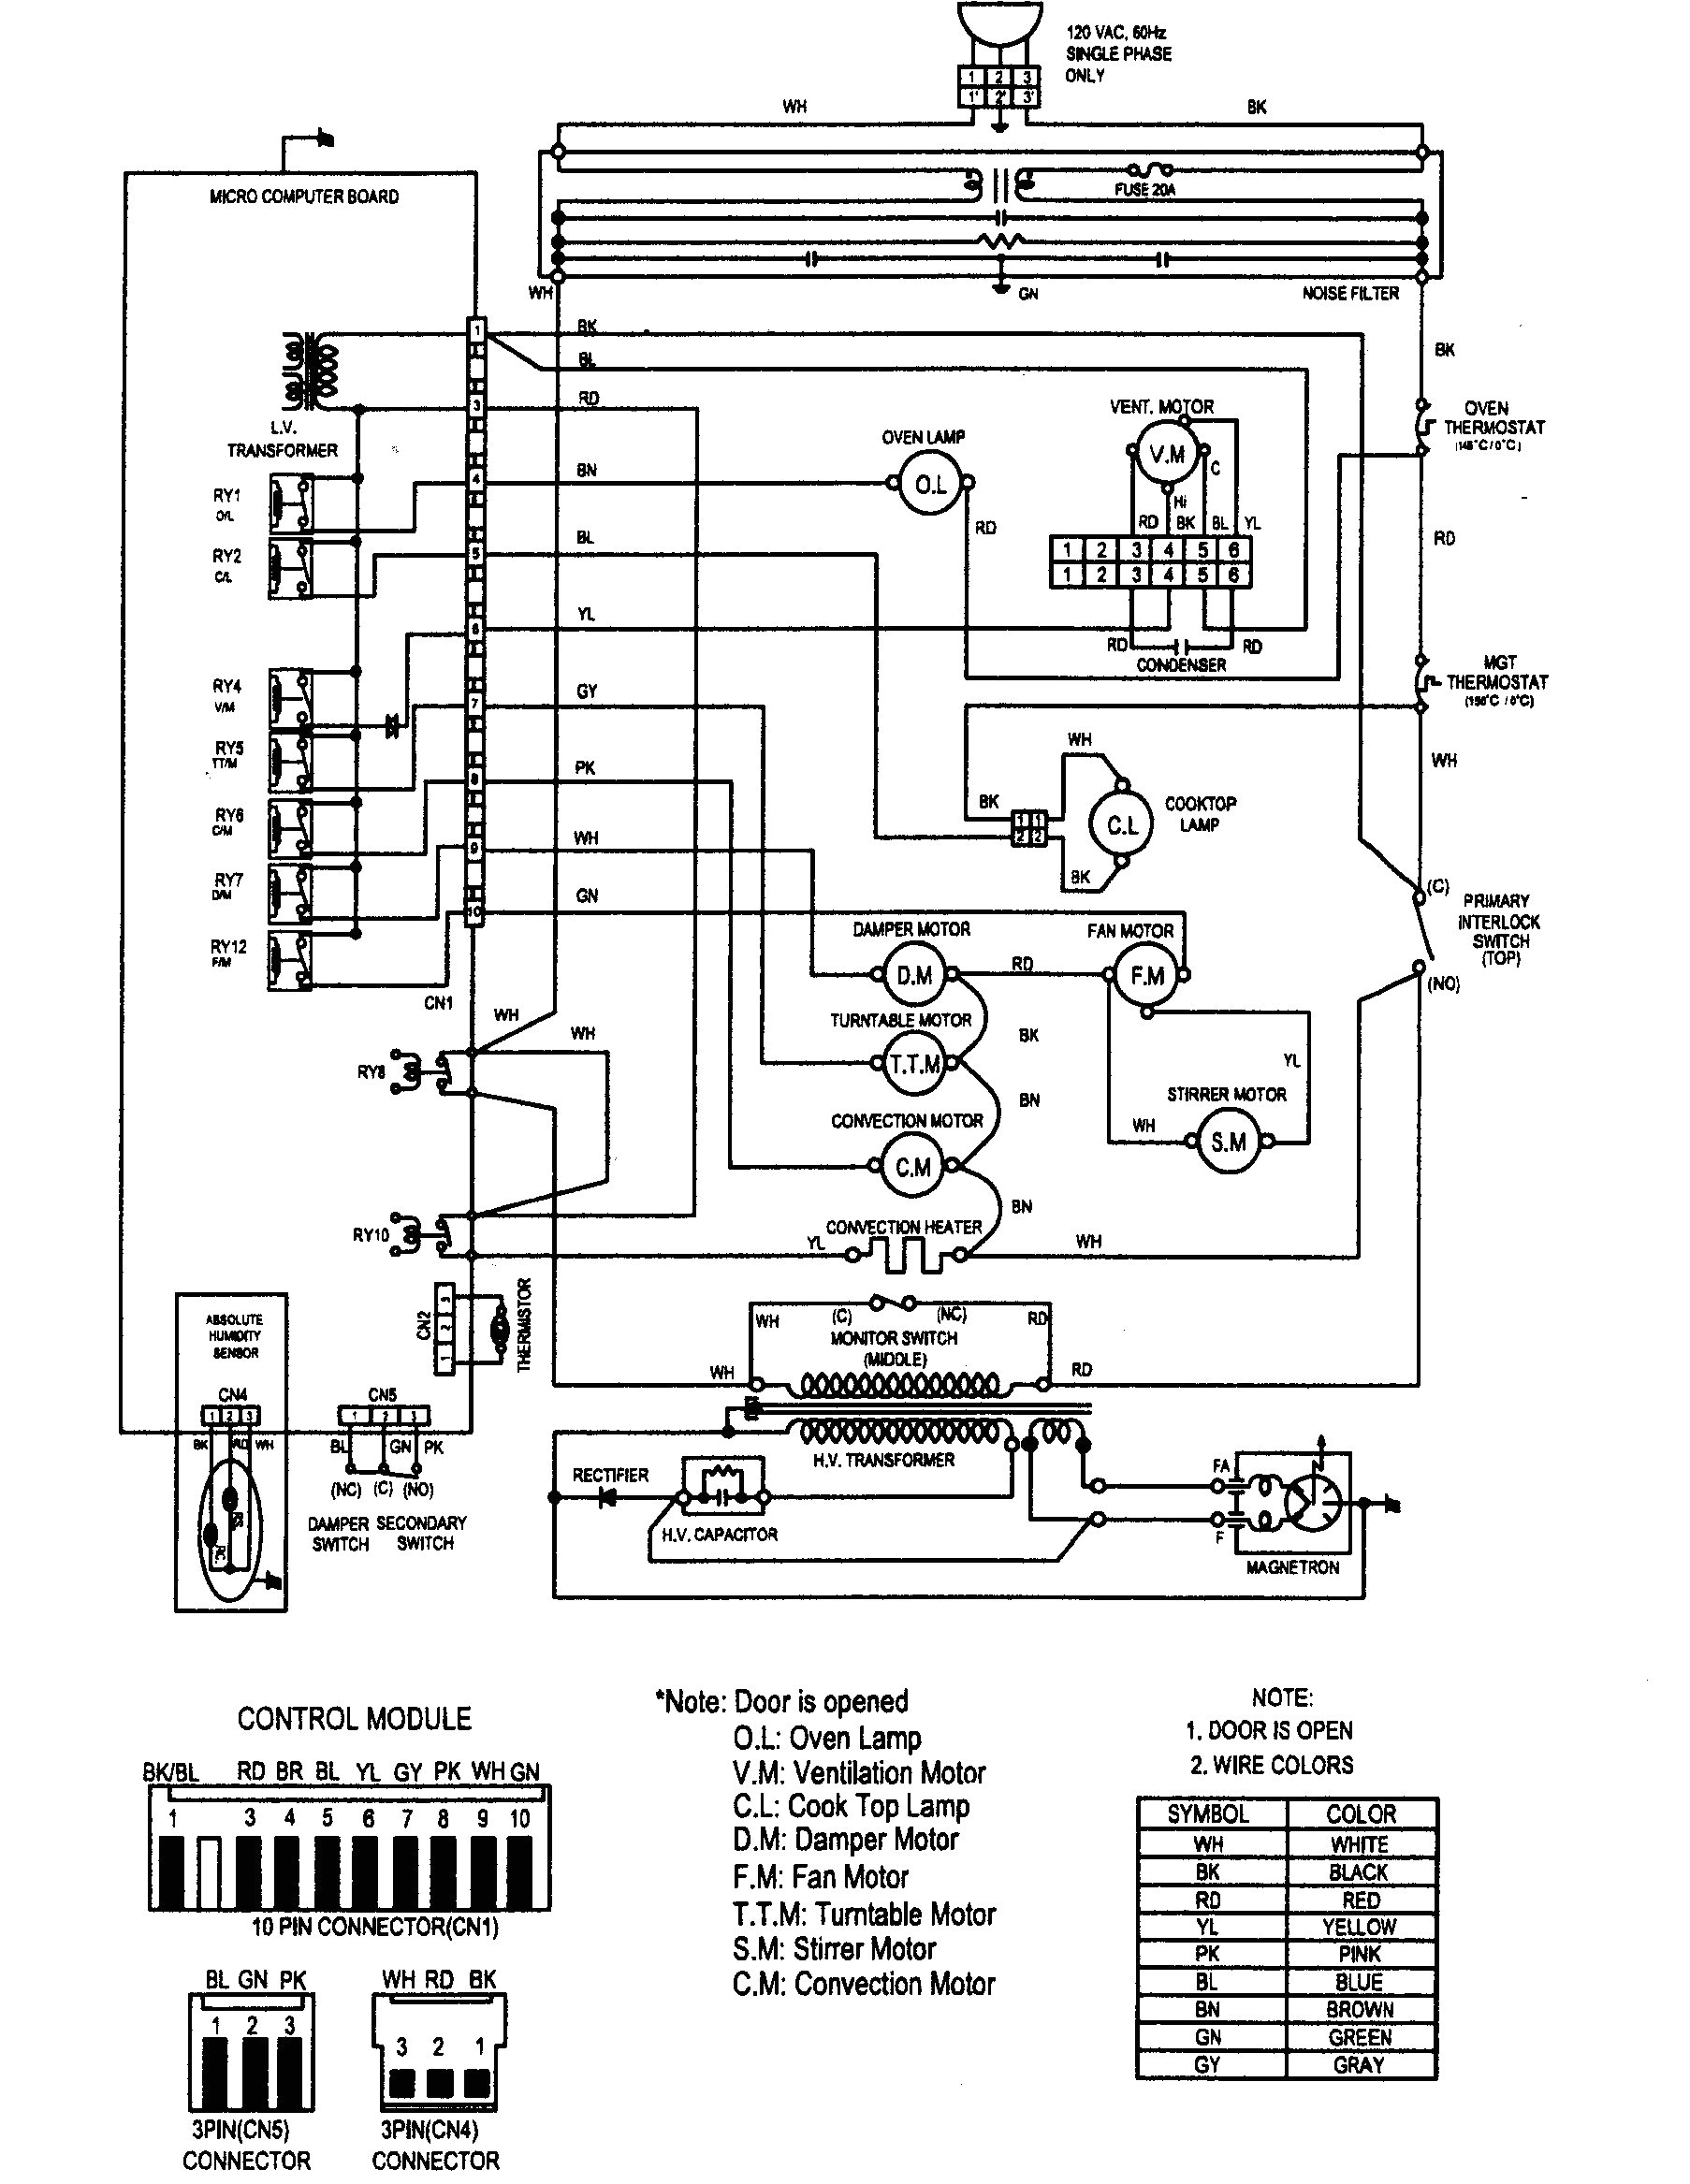 amana dryer wire diagram wiring diagramamana dryer diagram 14